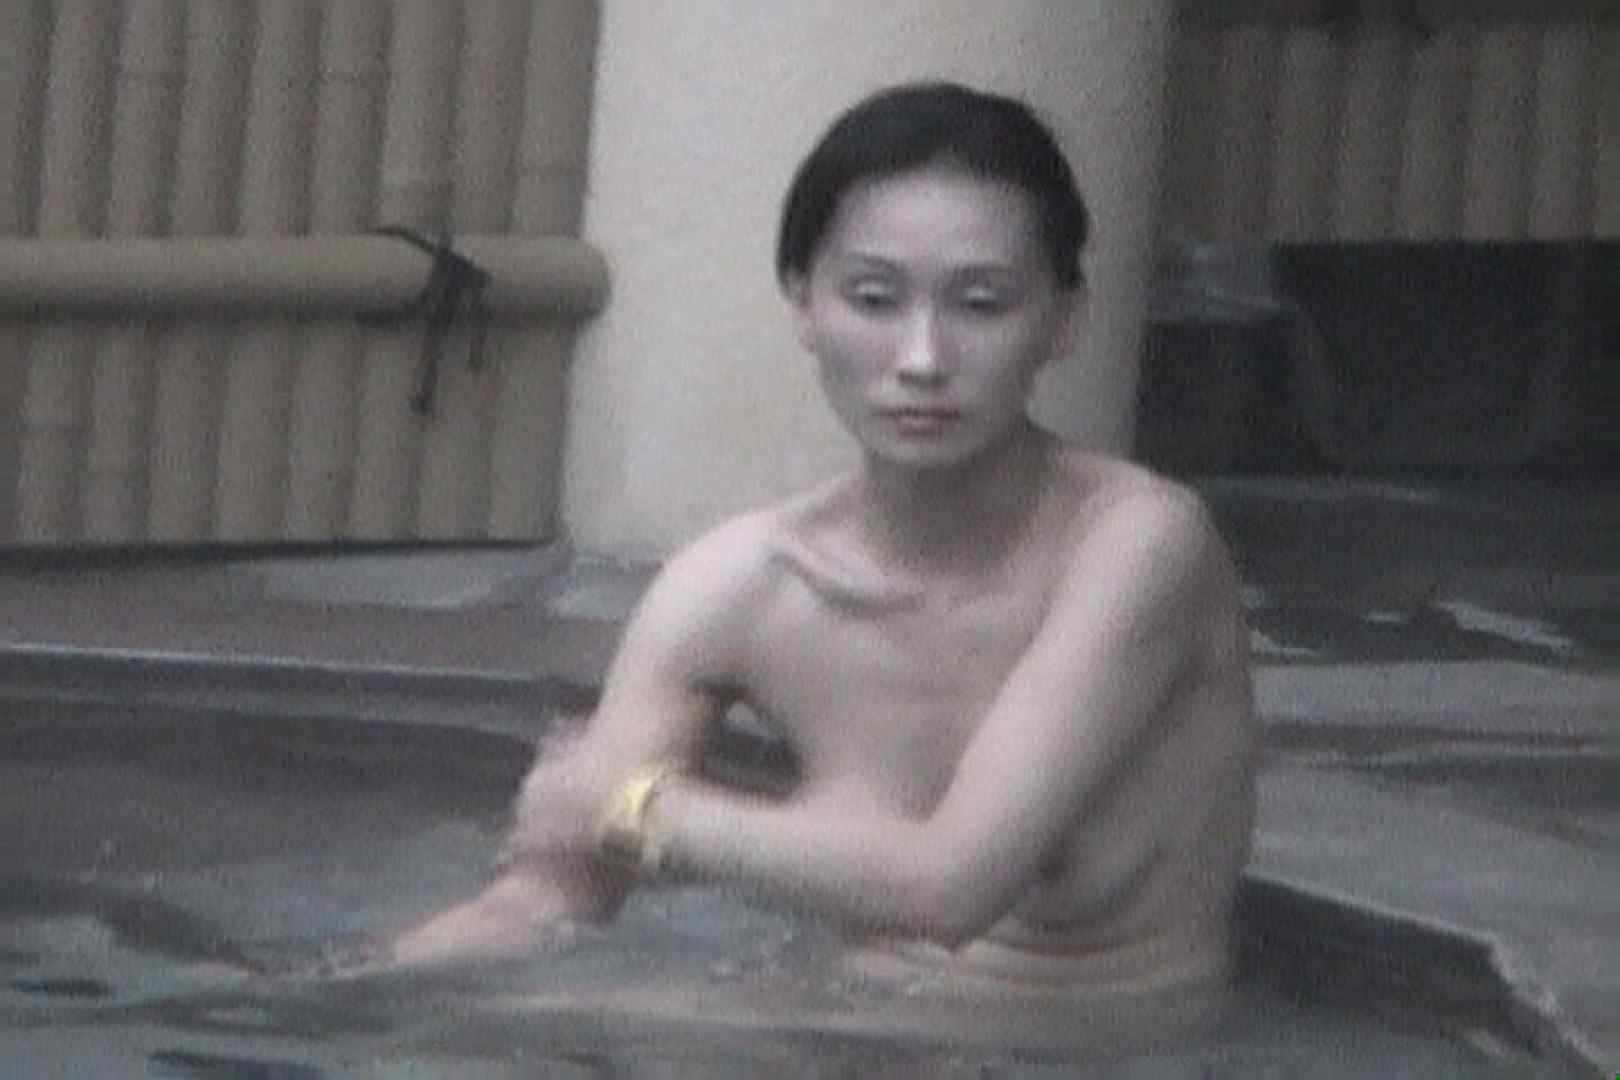 Aquaな露天風呂Vol.557 露天 | OL女体  40連発 40